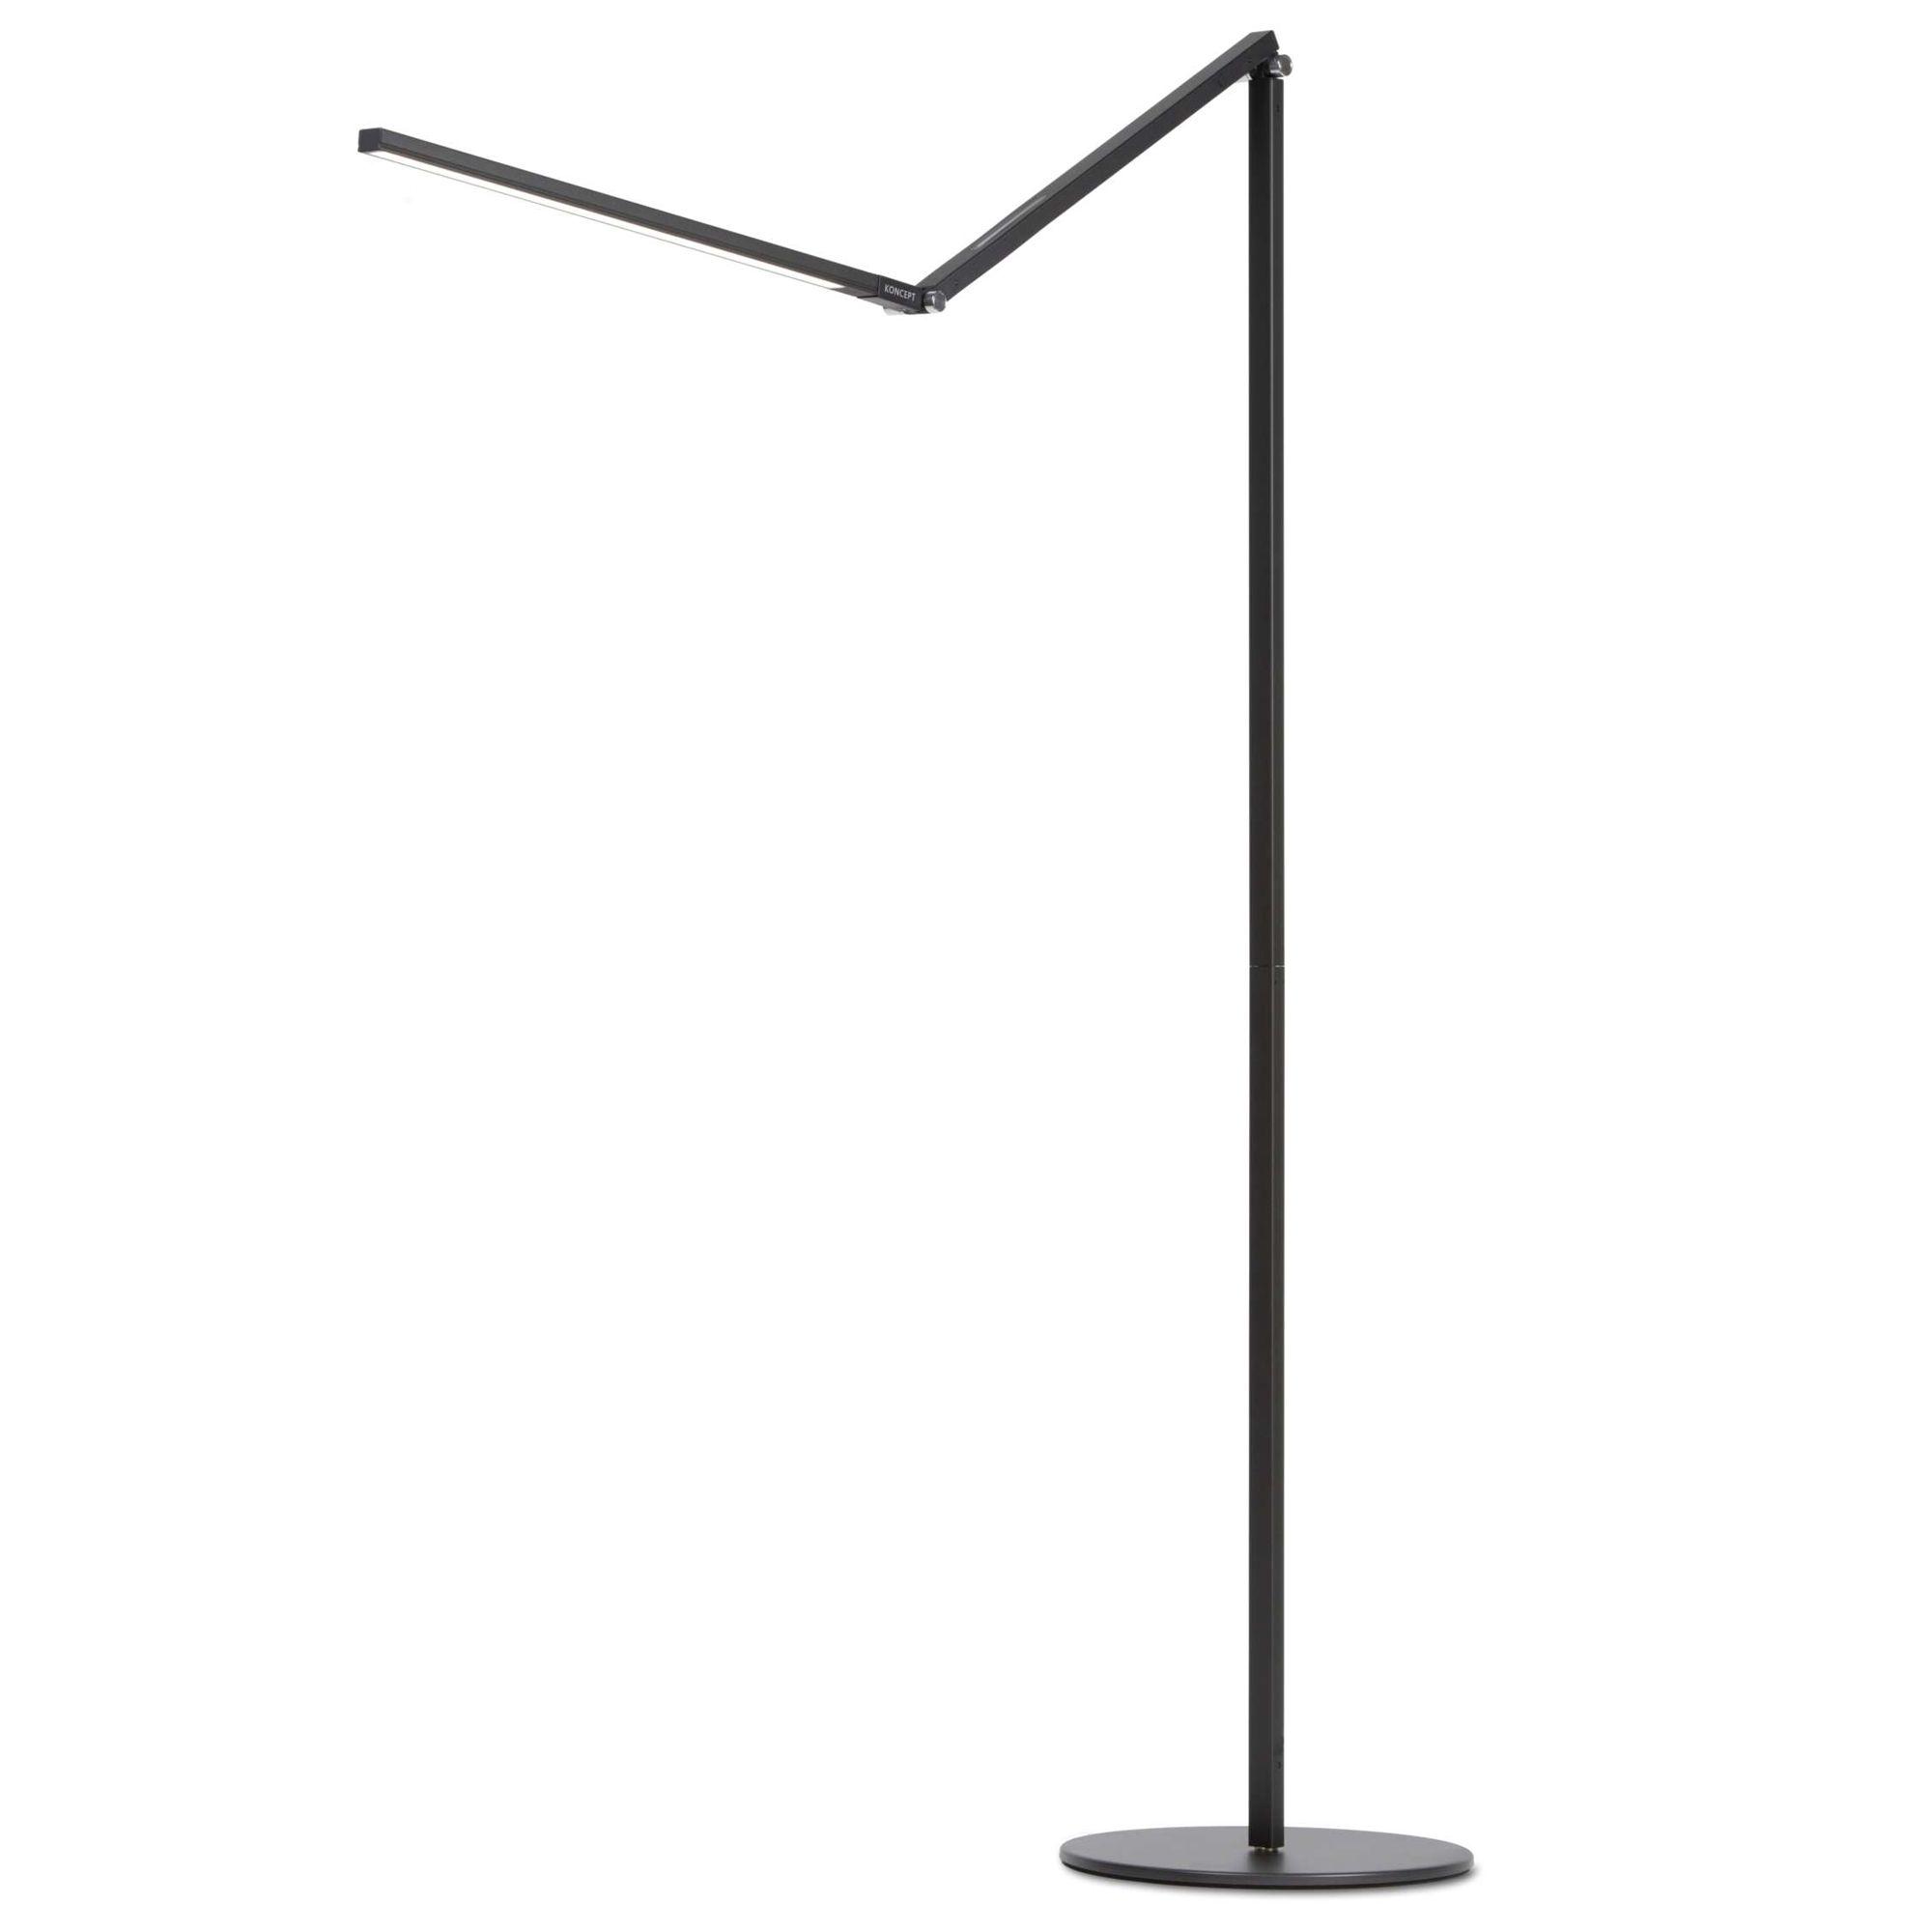 Z Bar Led Floor Lamp By Koncept Lighting Ar5000 Wd Mbk Flr Led Floor Lamp Floor Lamp Lamp